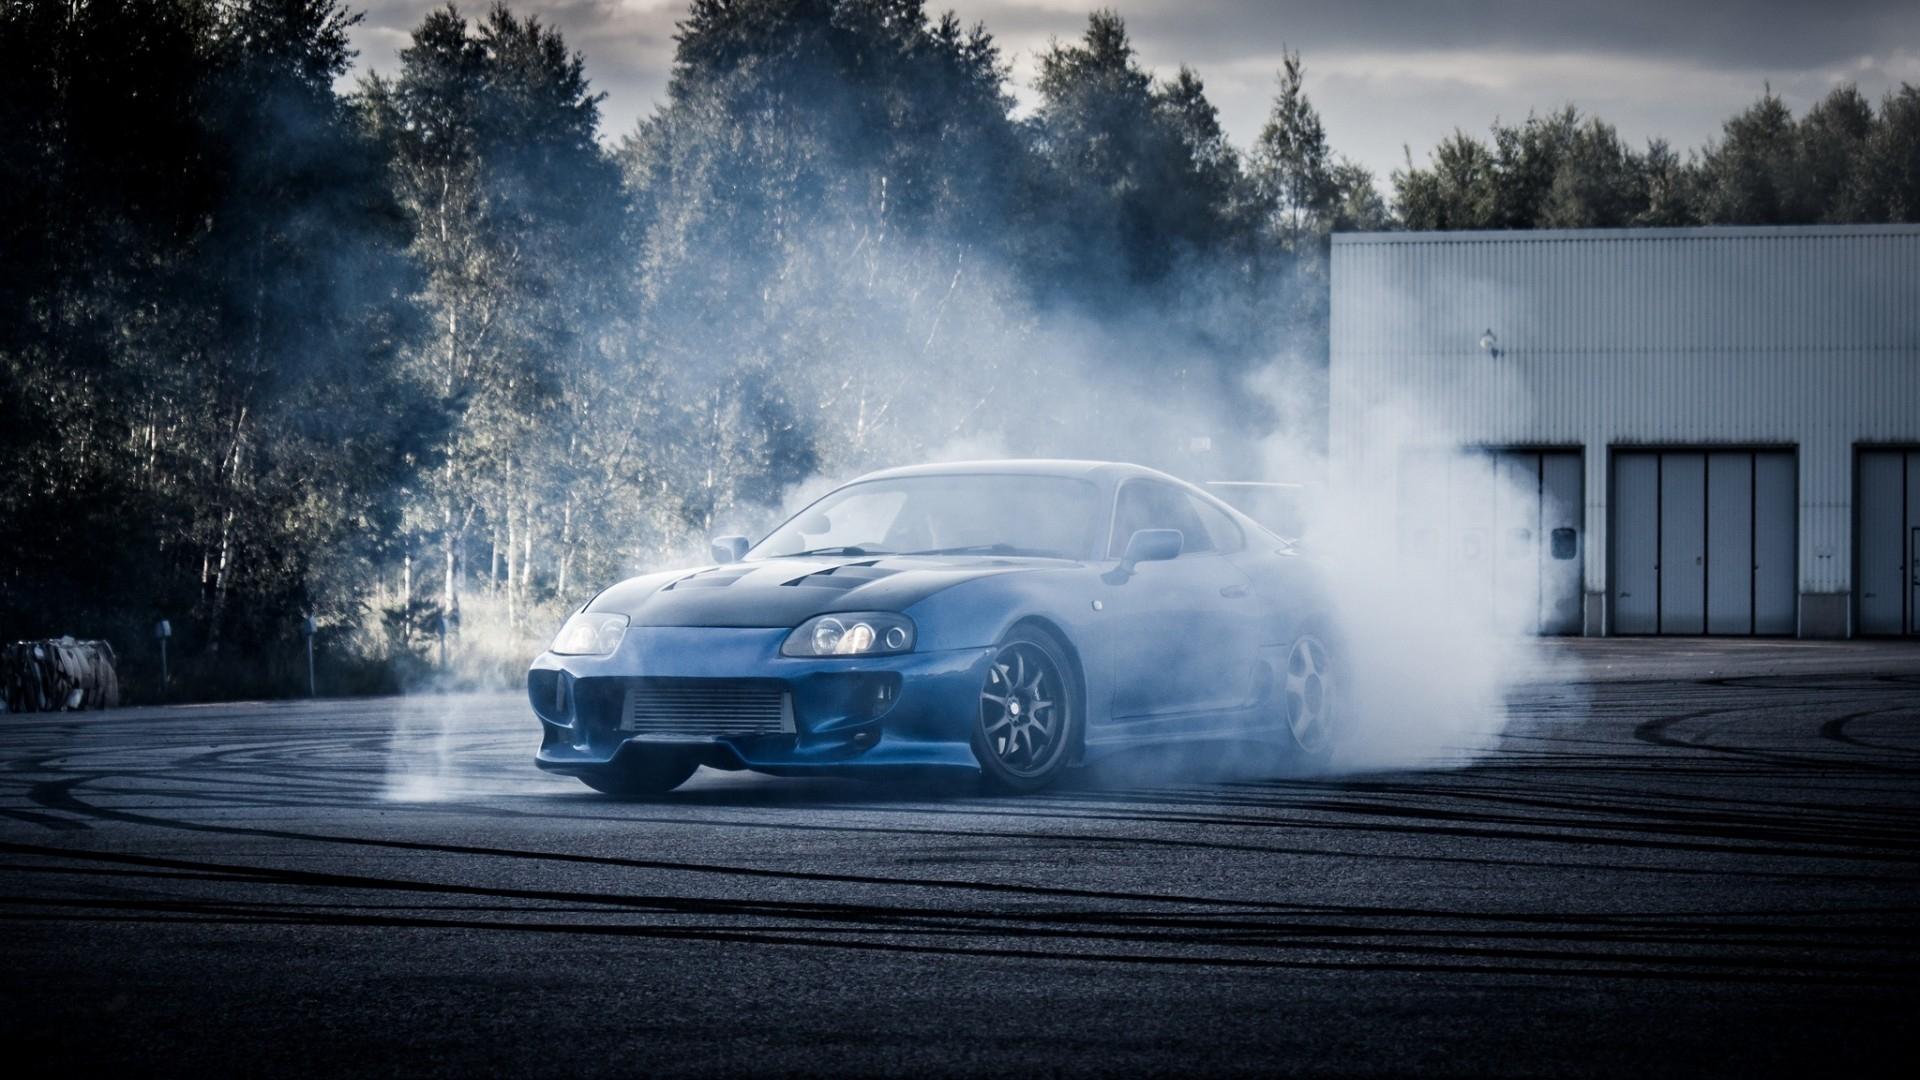 Drift With Gorgeous Blue Toyota Supra